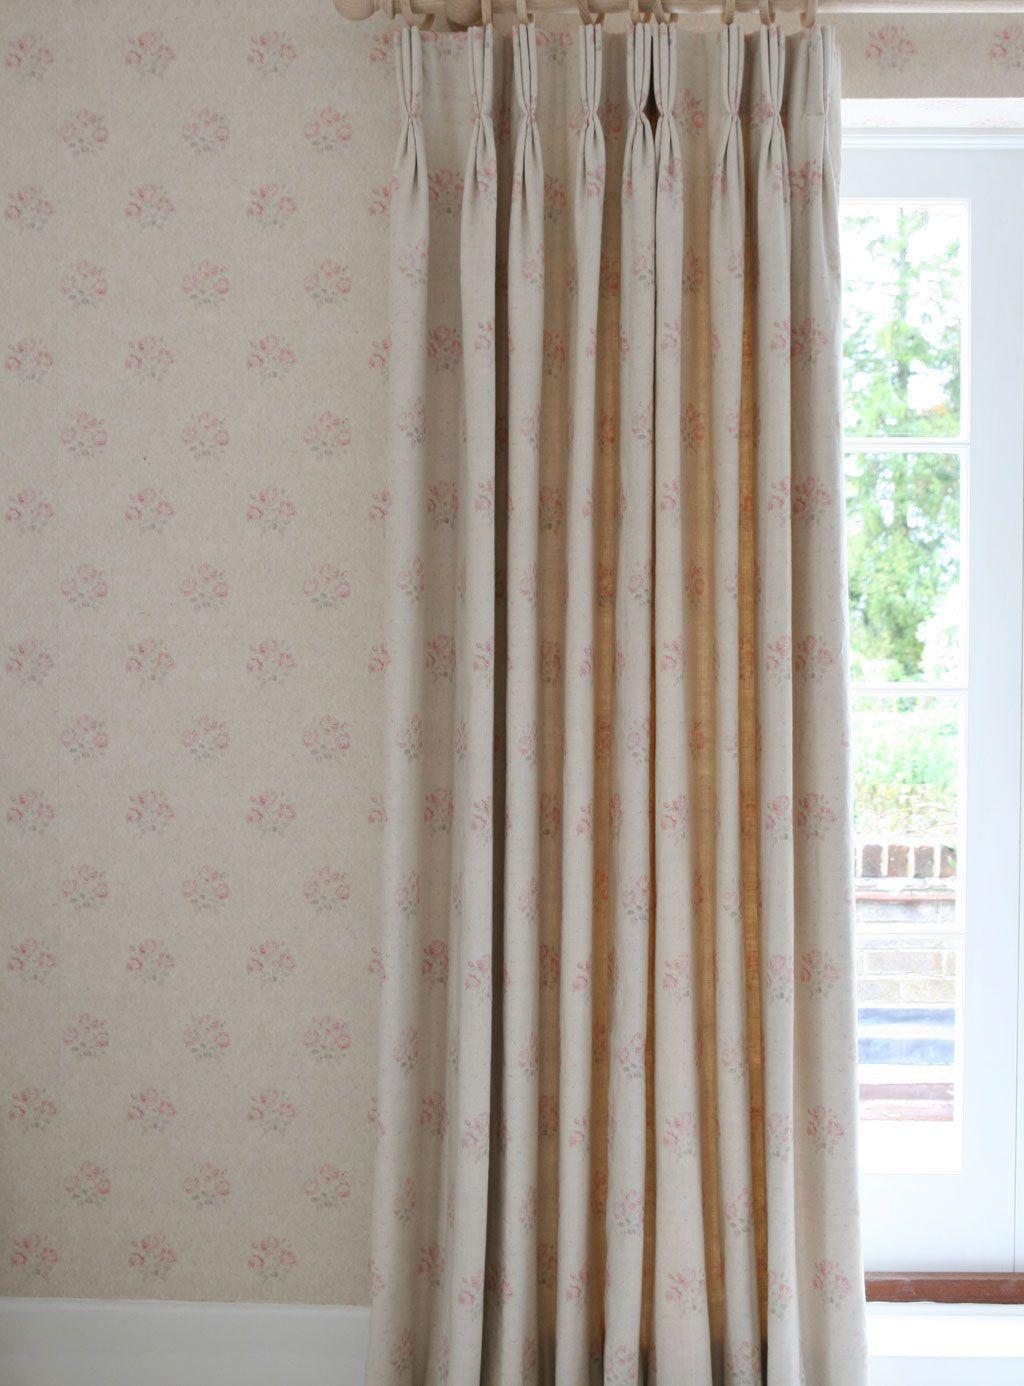 Wallpaper Curtains And Cushions To Match Curtain Menzilperdenet